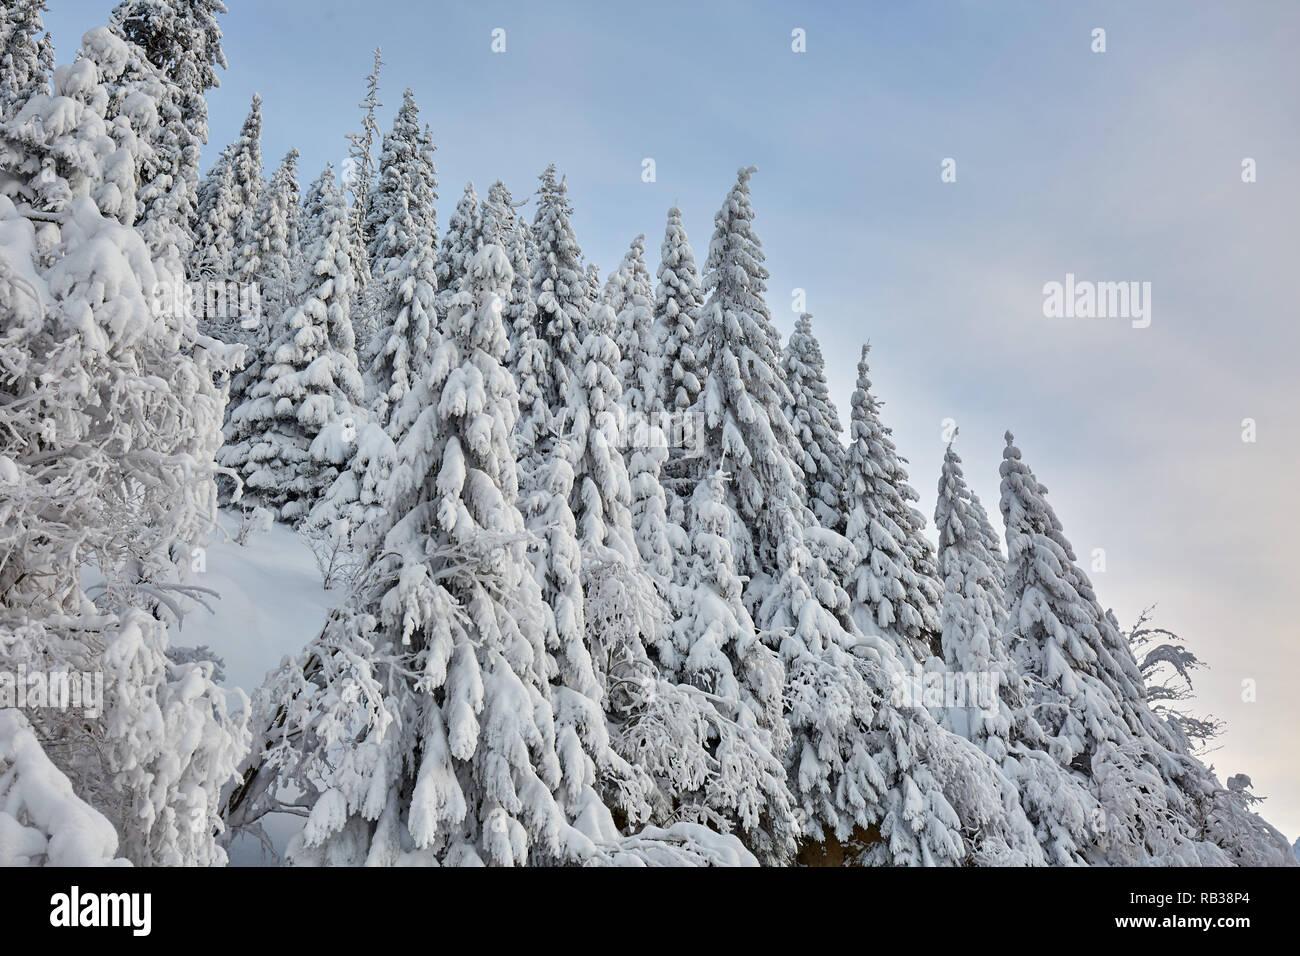 Paisaje de montaña con abetos cubiertos de nieve Foto de stock